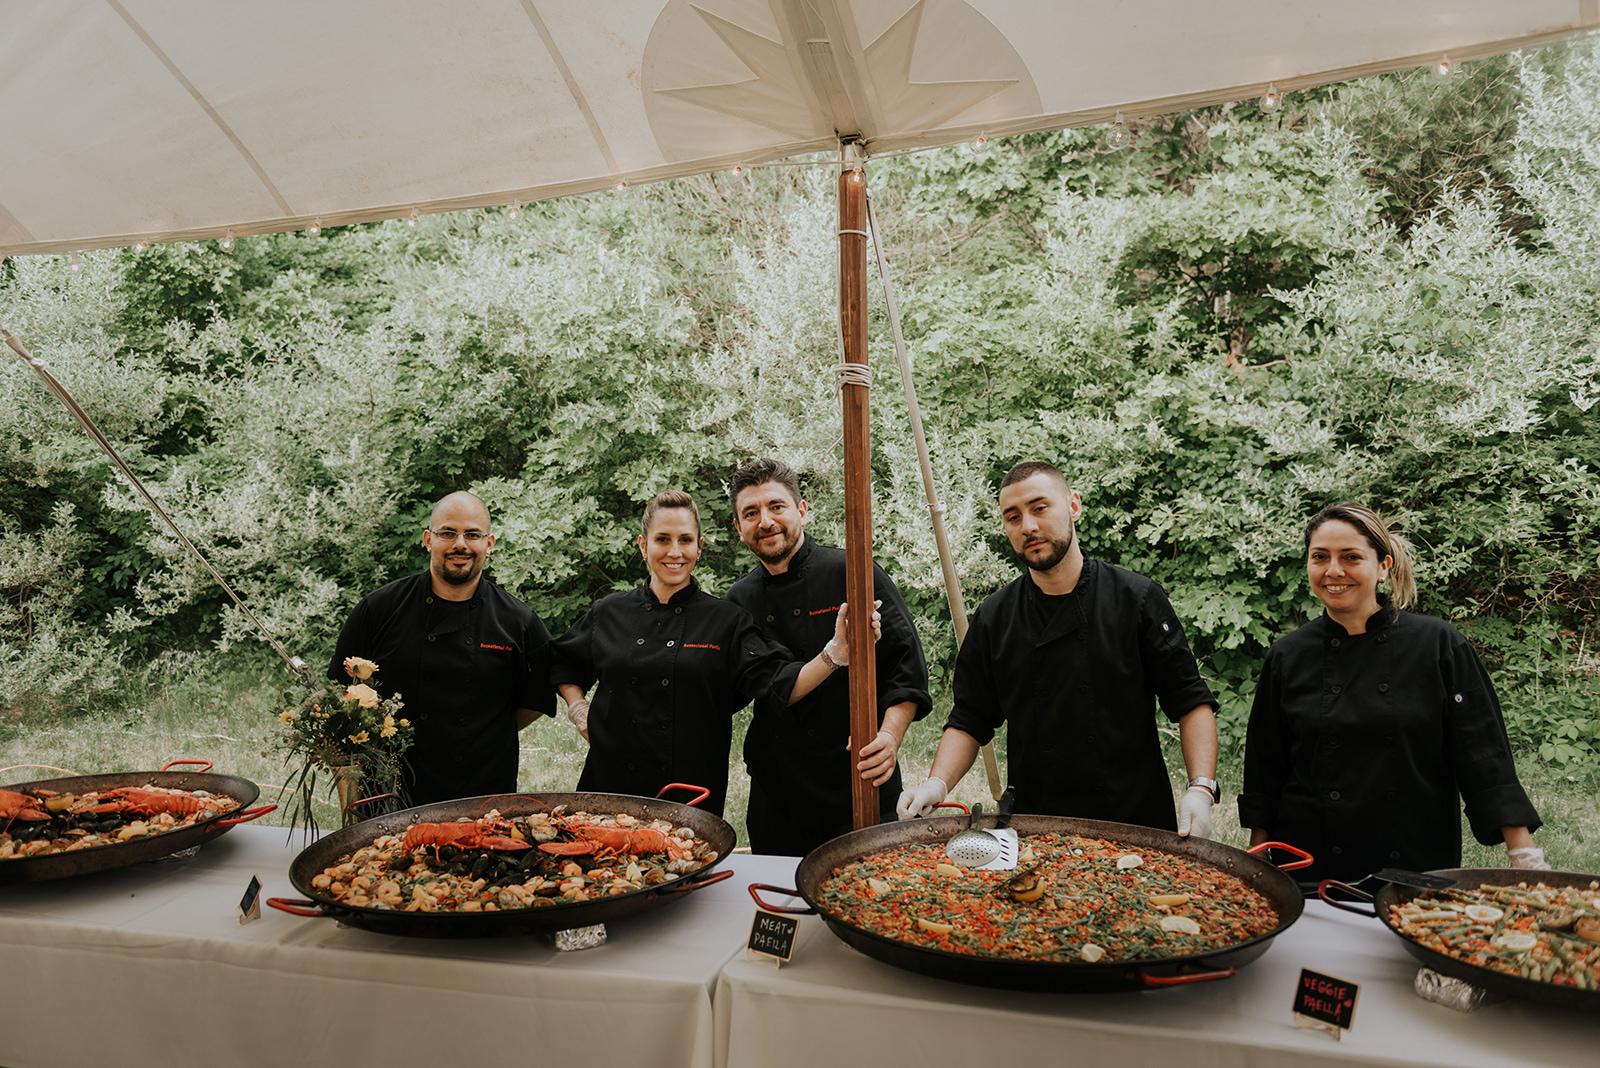 Paella for wedding reception food! - Pearl Weddings & Events